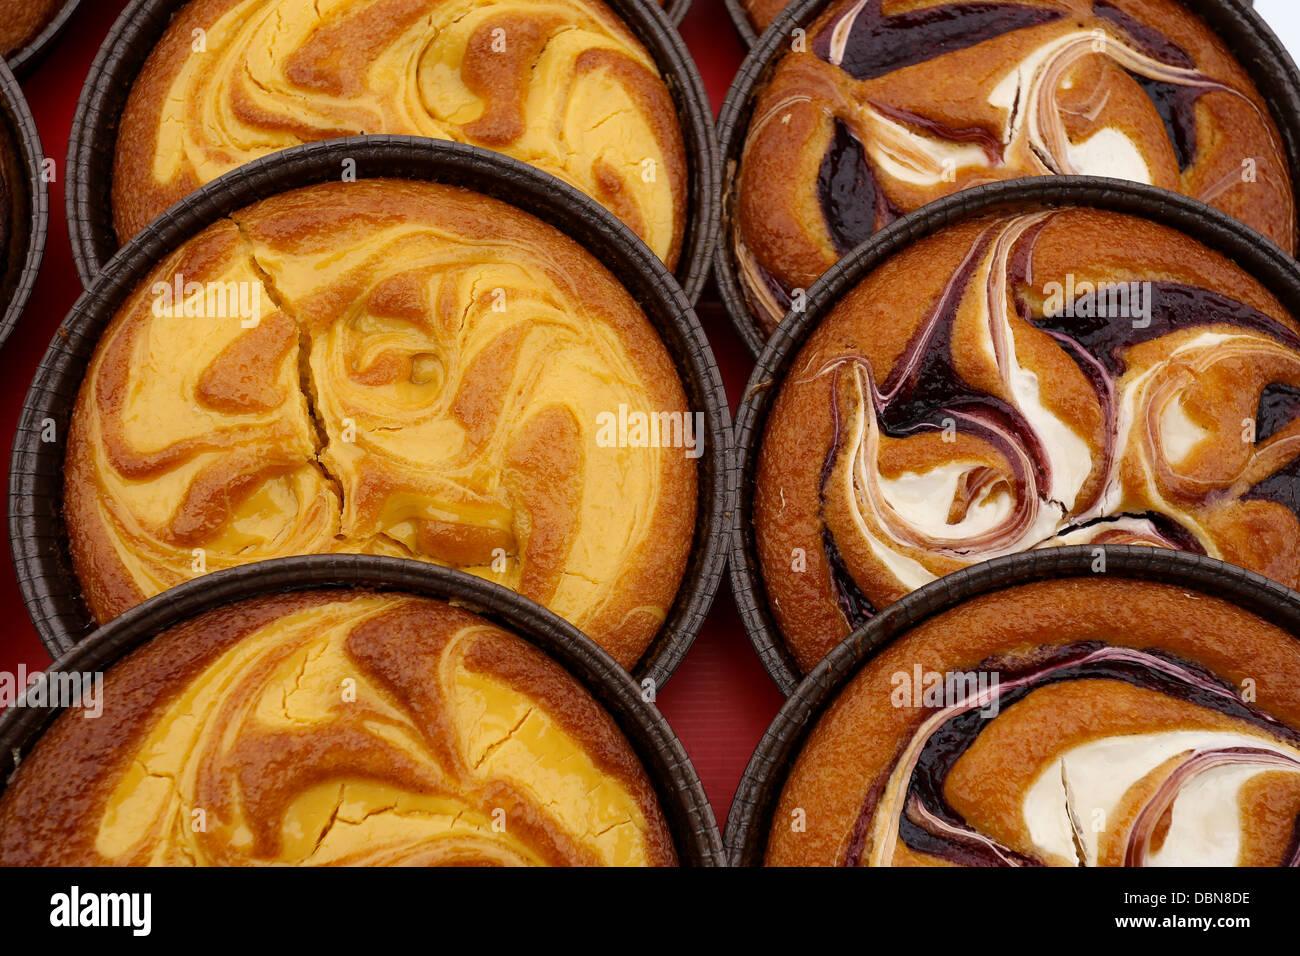 Custard cream tarts and Raspberry tarts on display - Stock Image